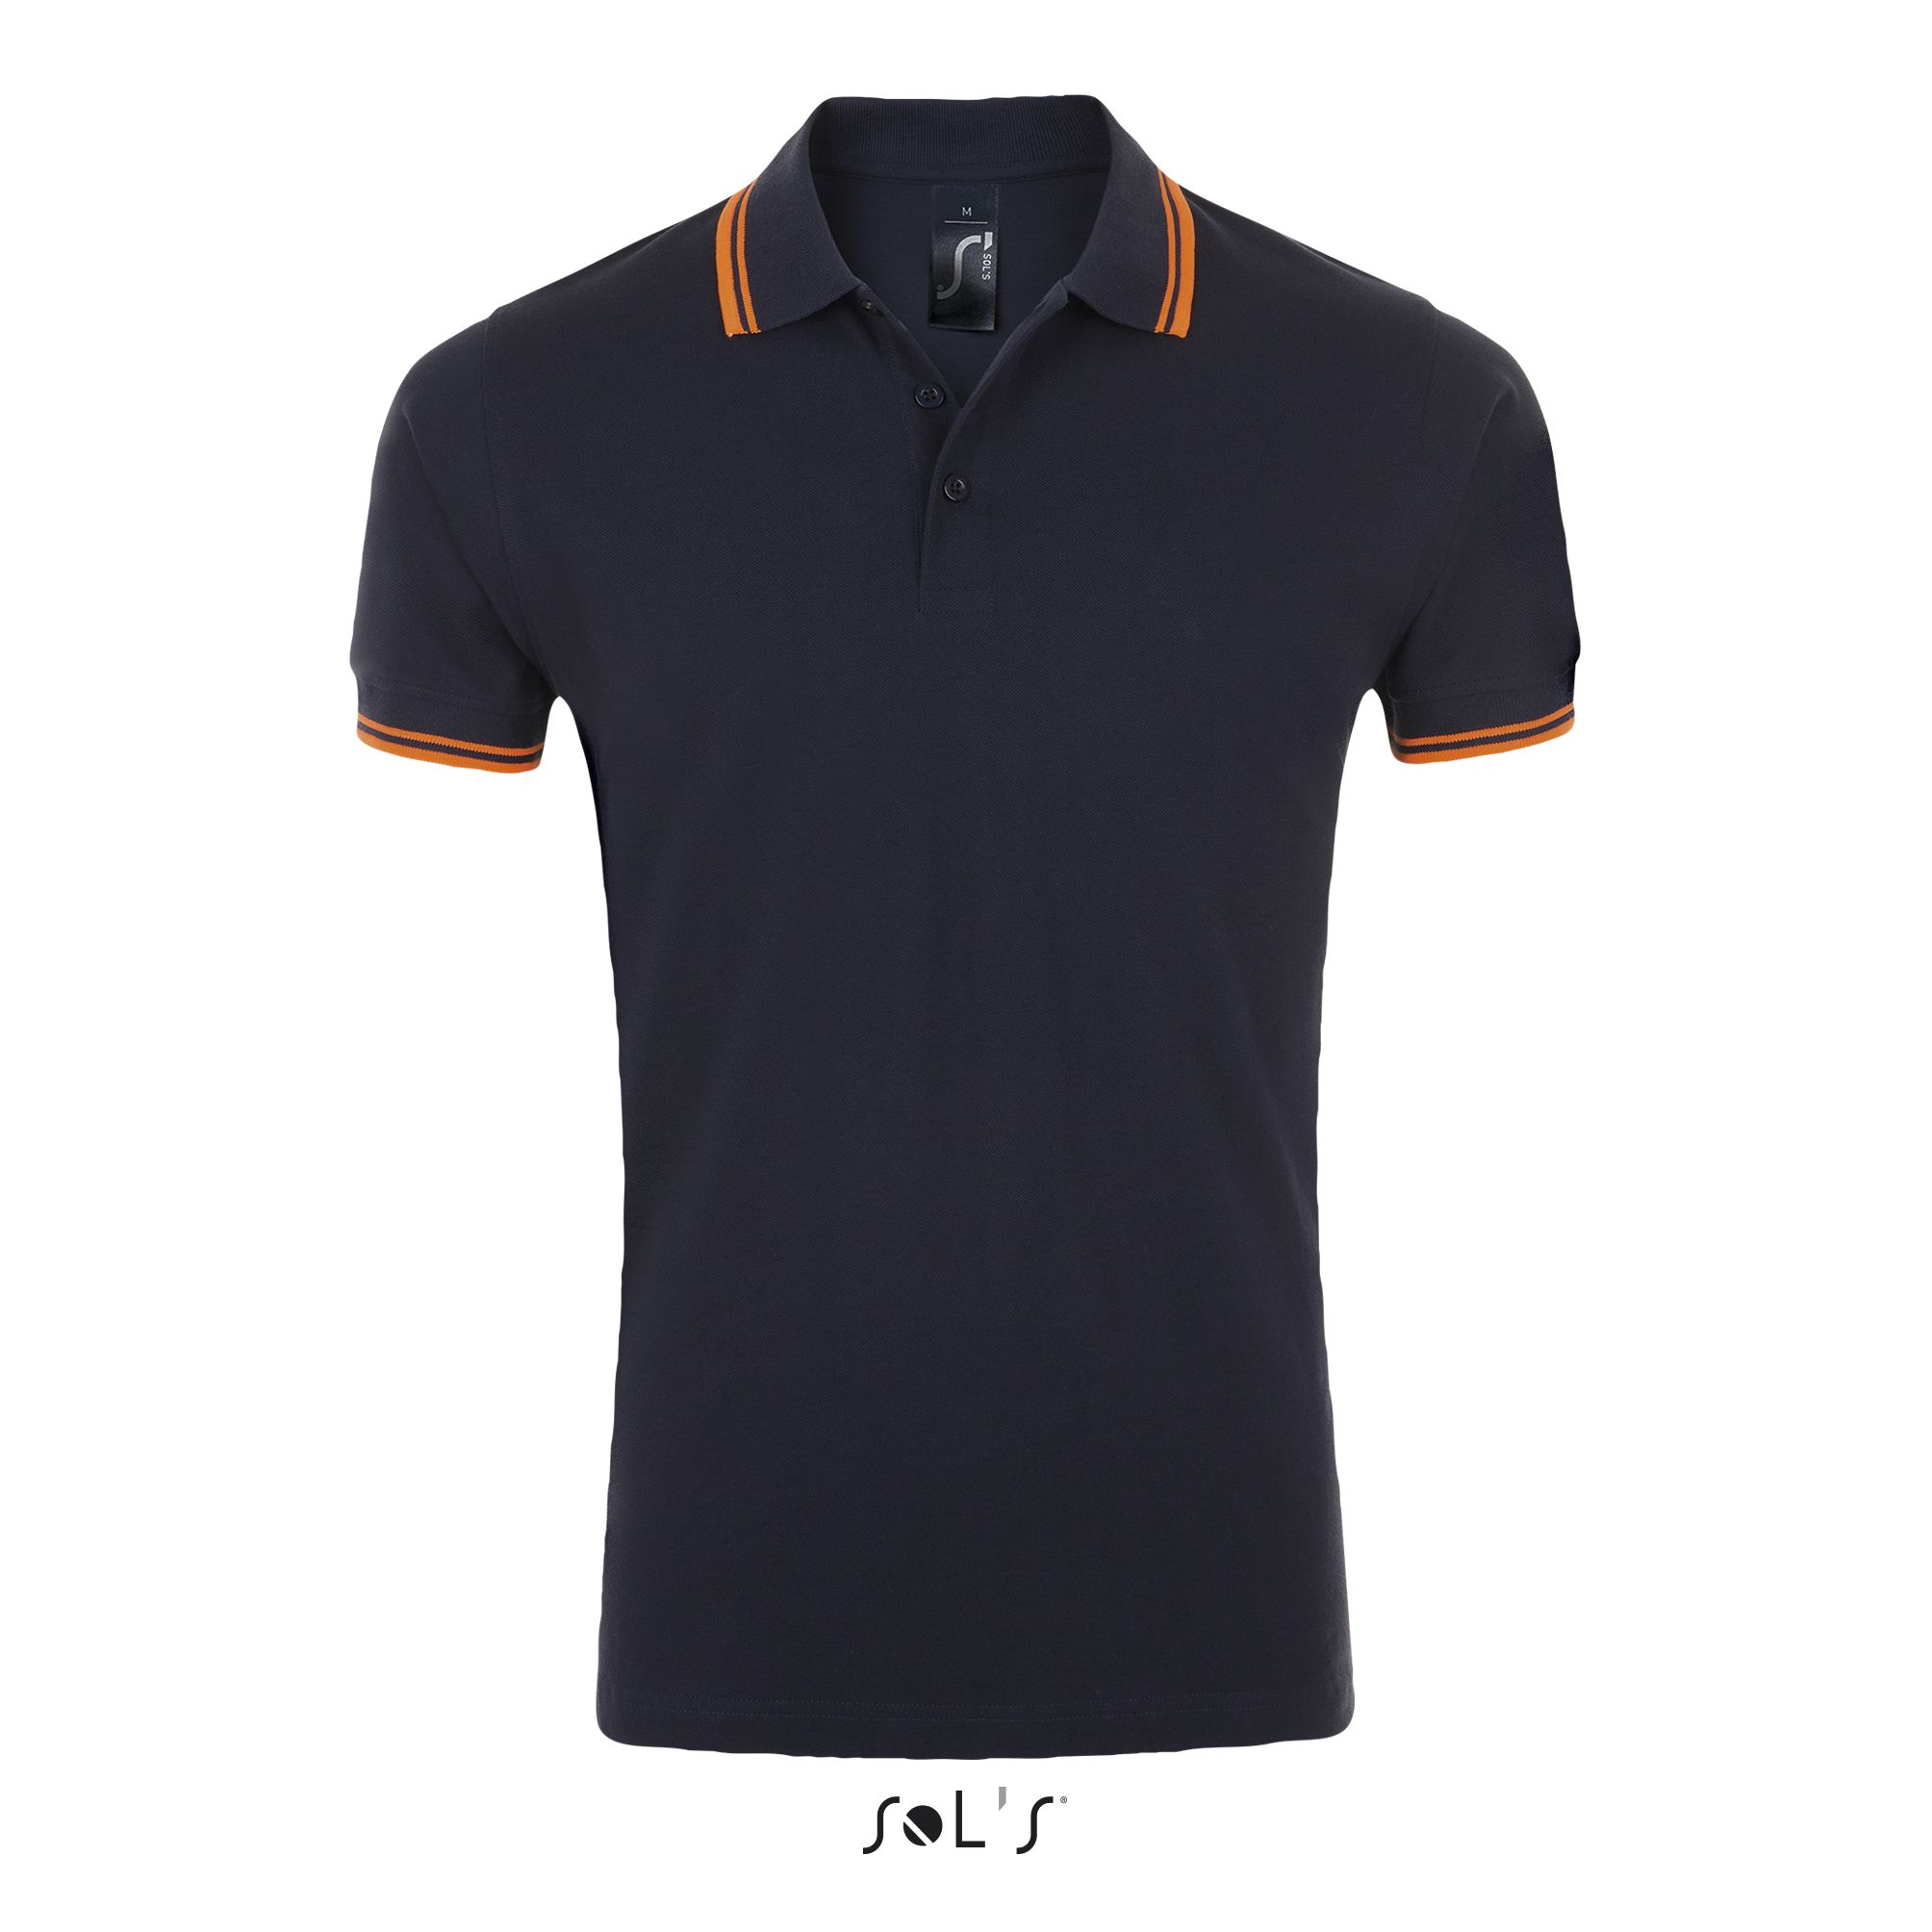 535 - French navy / Neon orange